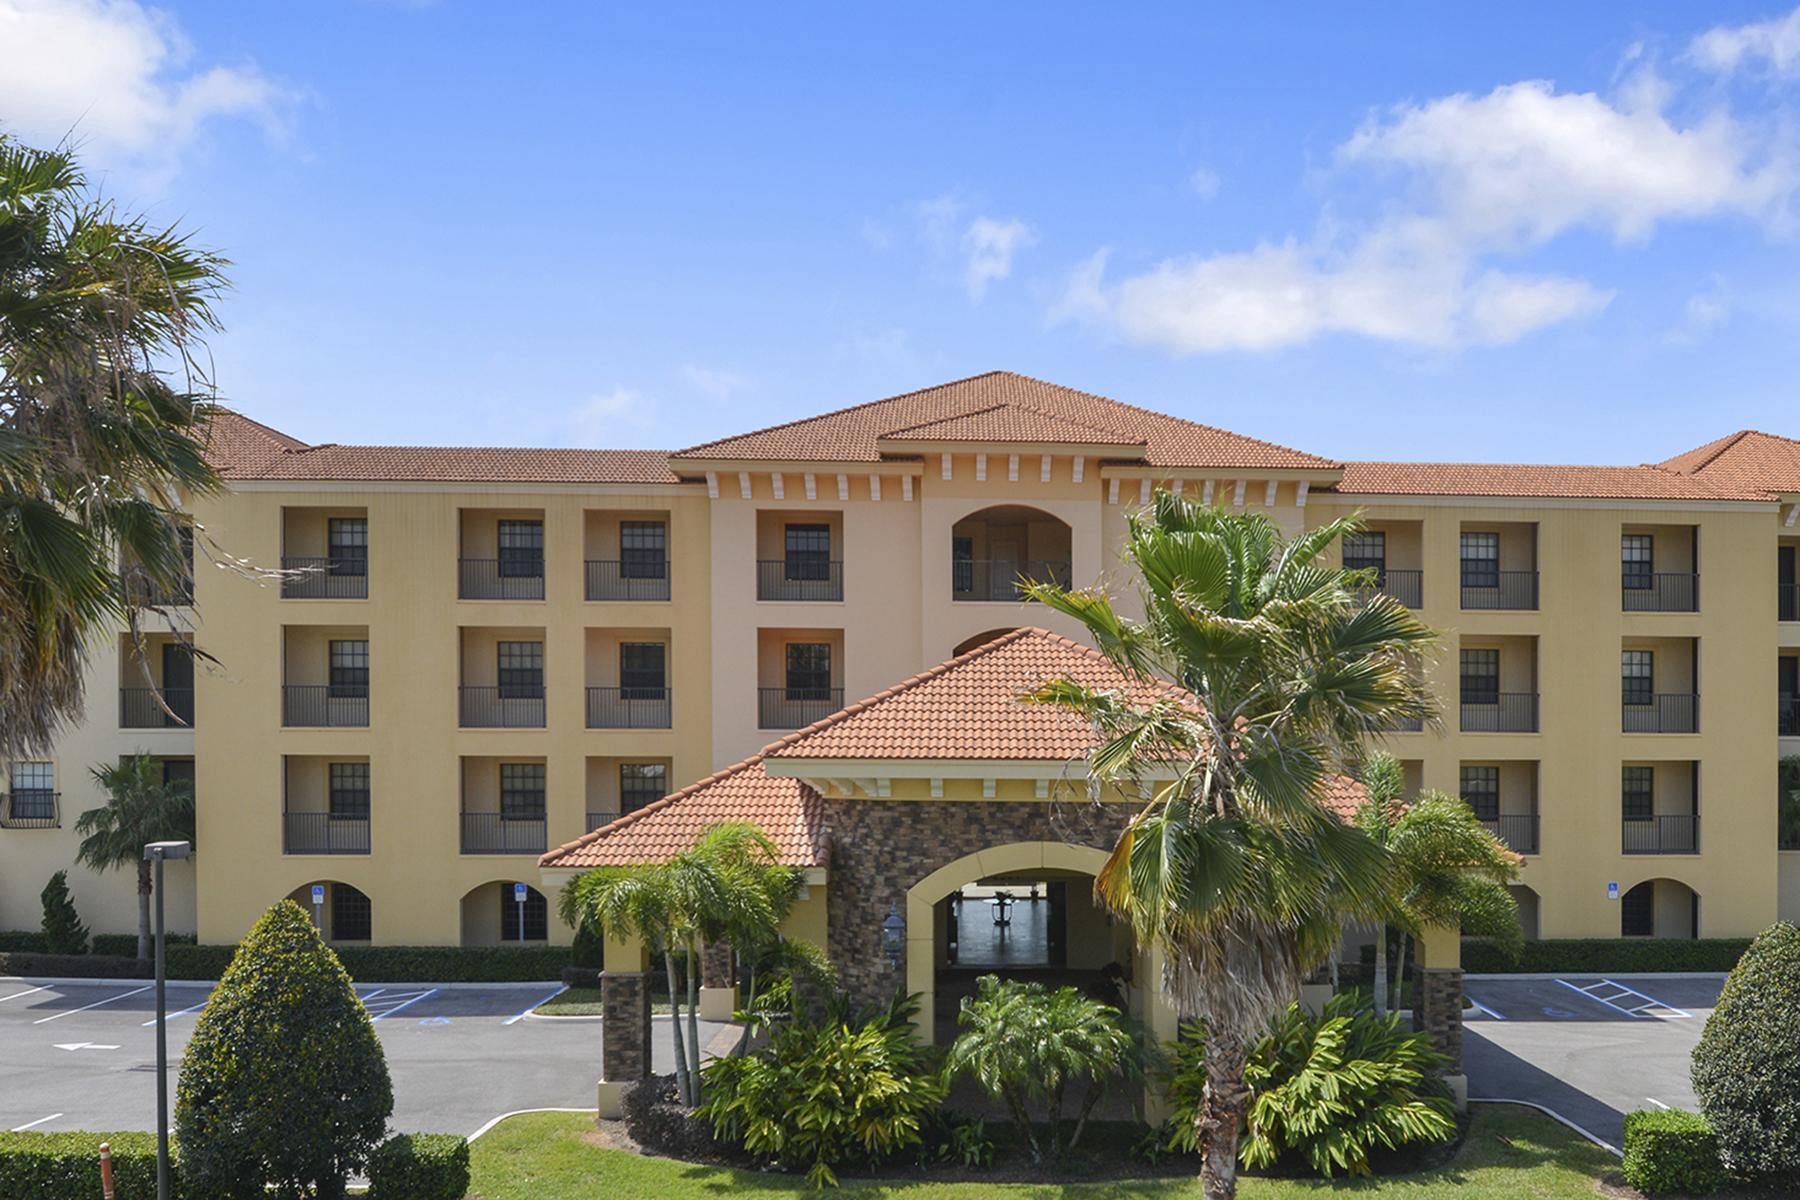 Condominium for Sale at SEBRING FLORIDA 2351 Lakeview Dr 317 Sebring, Florida, 33870 United States